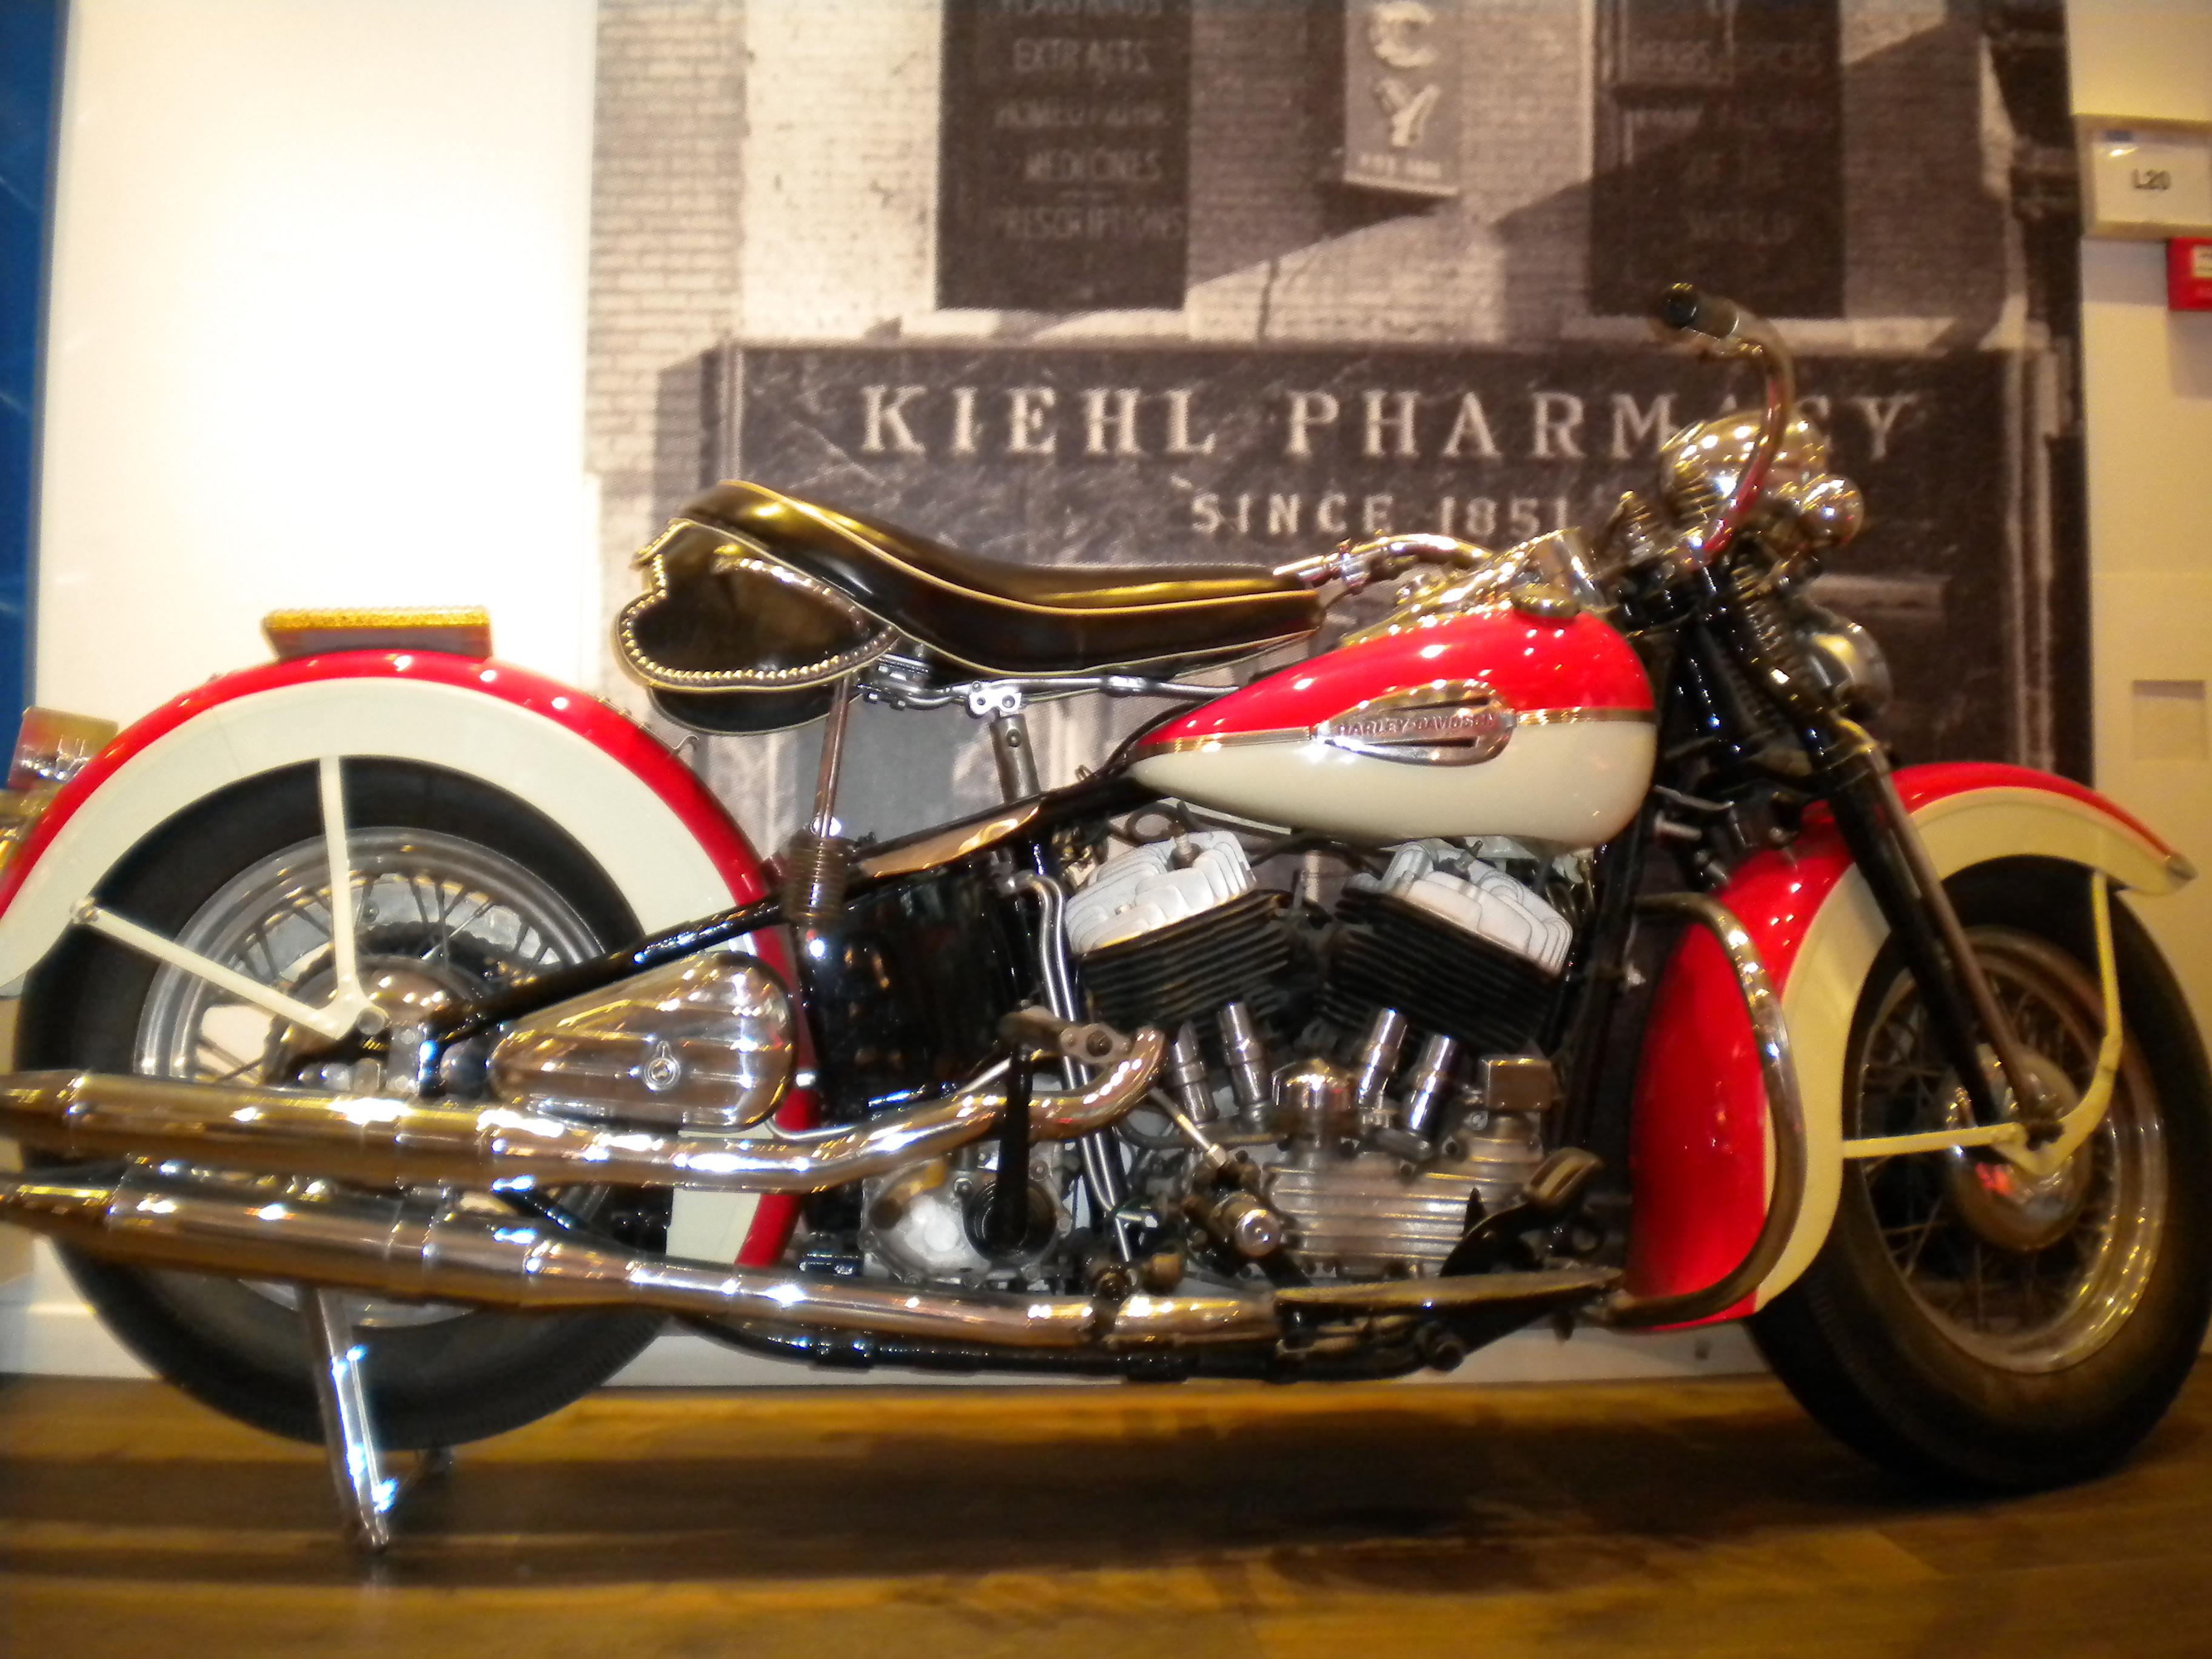 Old Harley Davidson: Harley Davidson, Motorcycles And